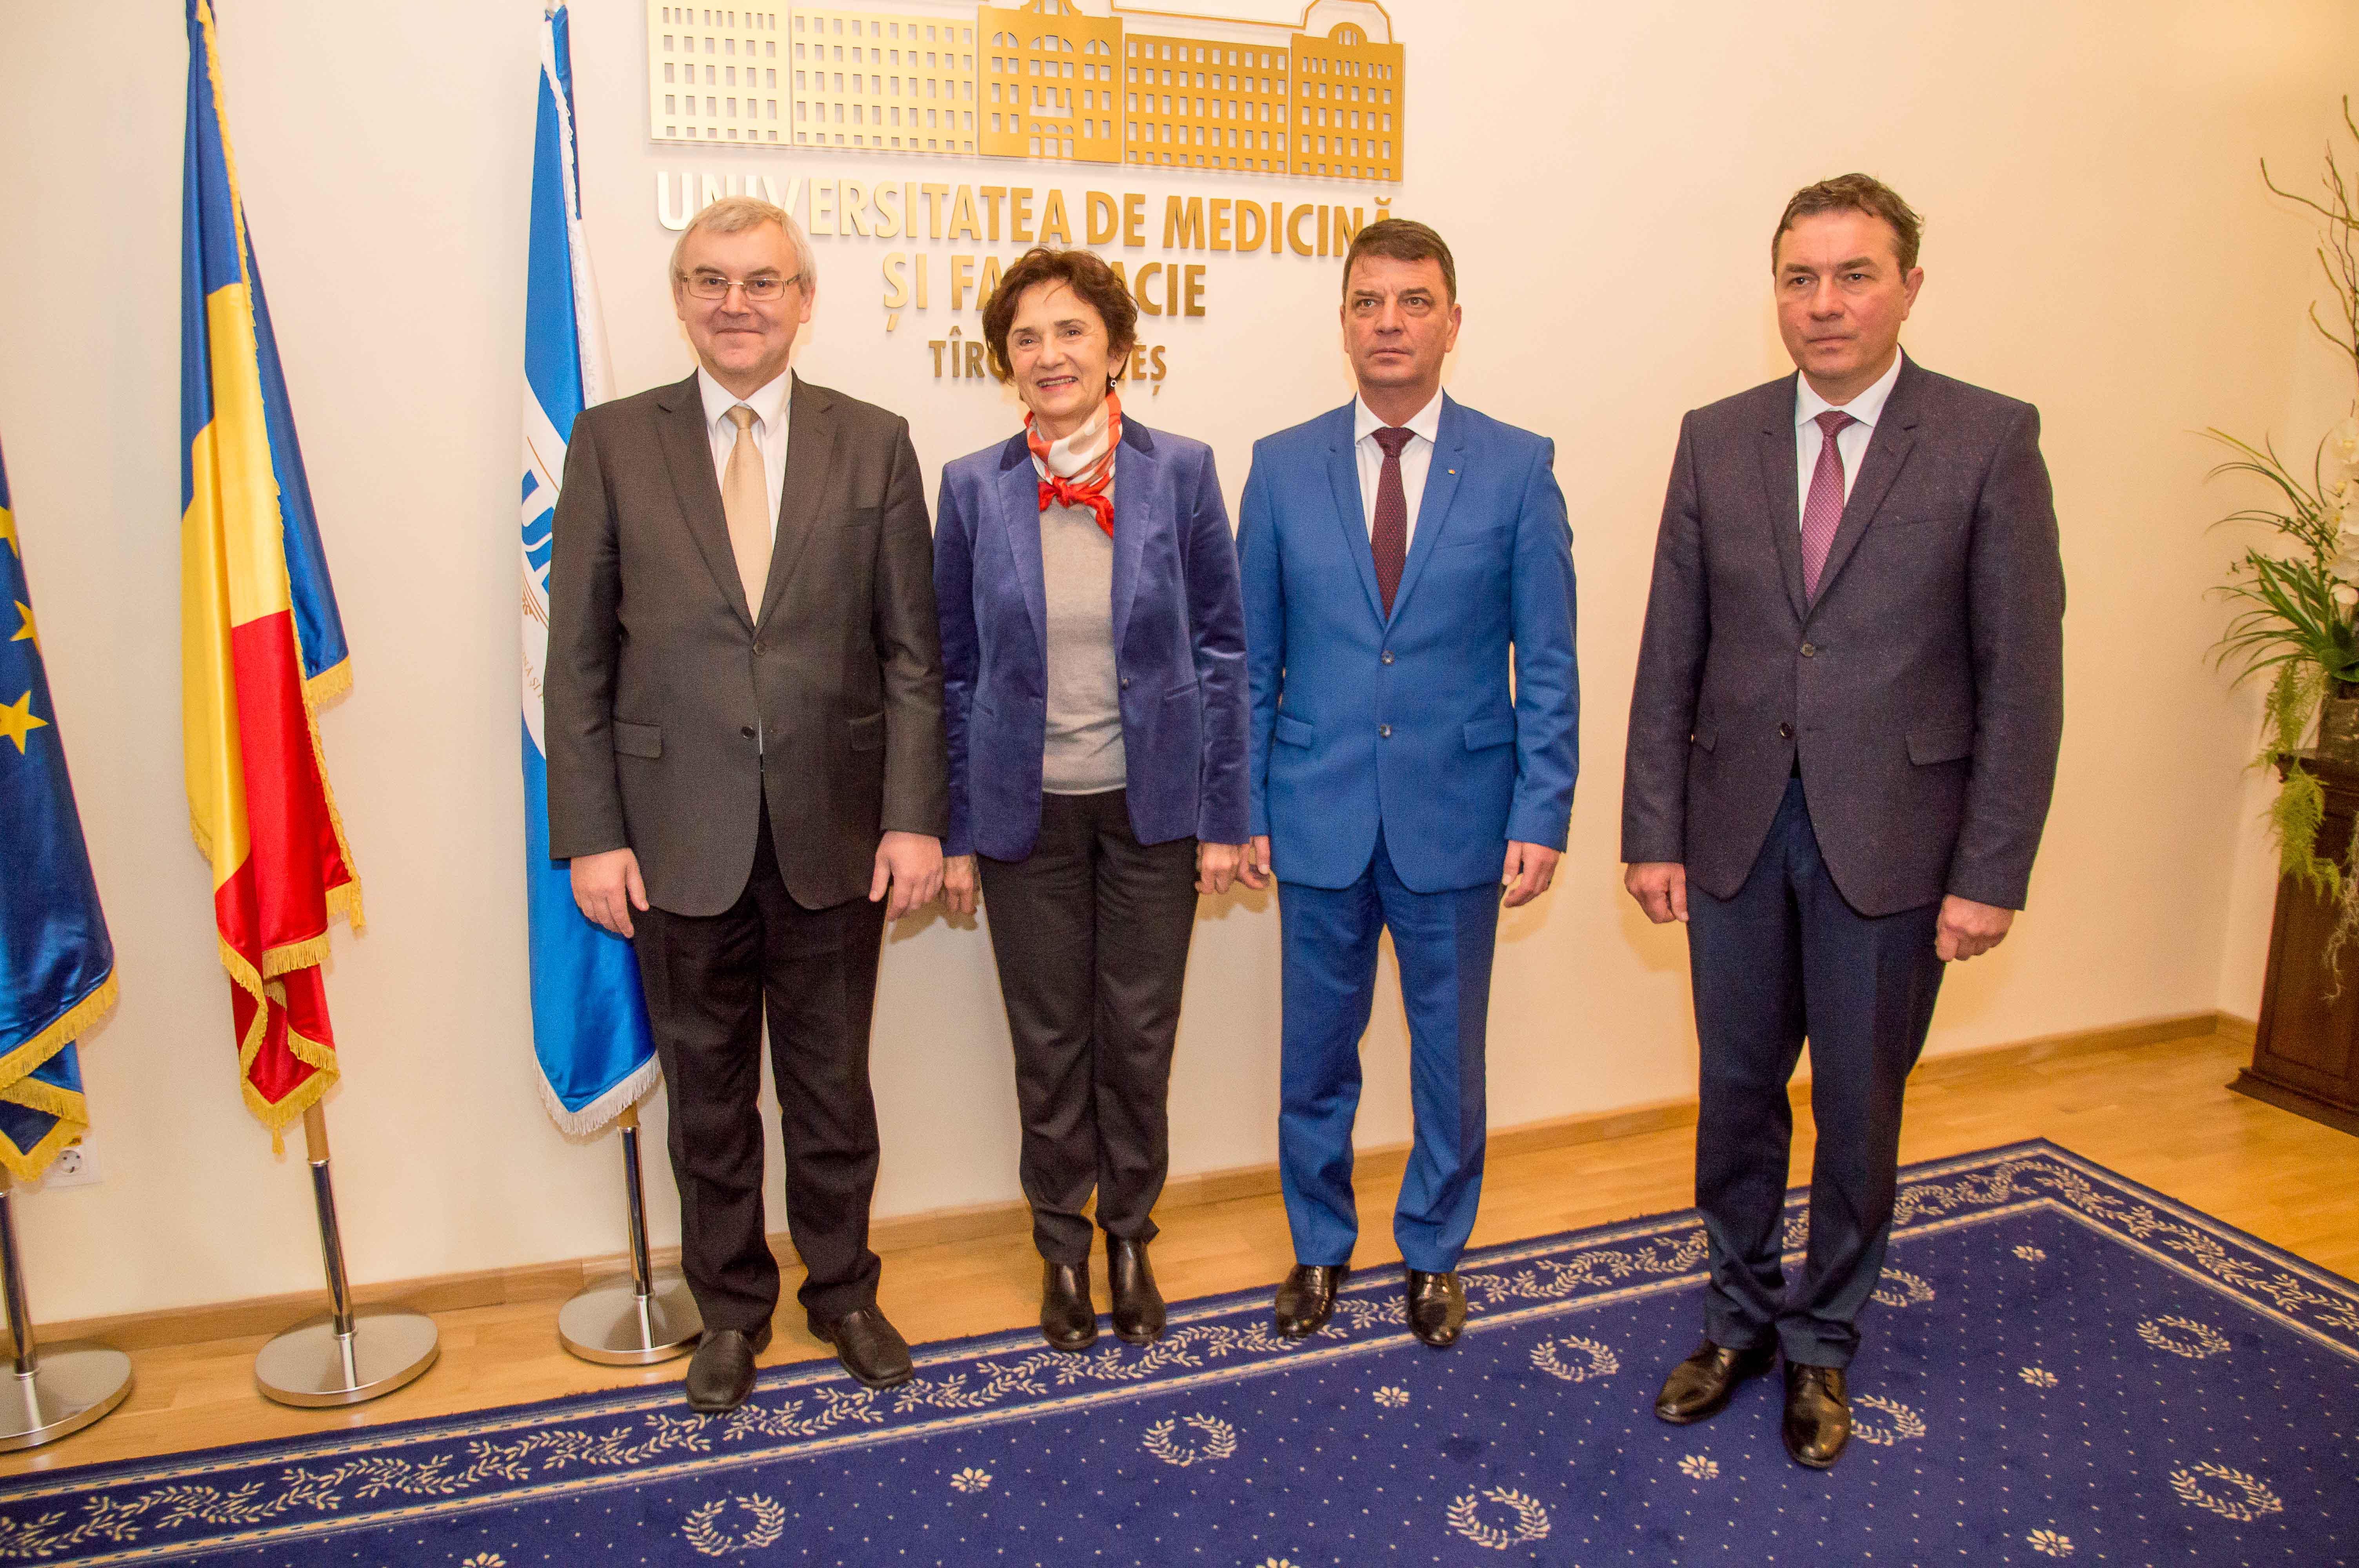 Vizita ambasadorului Belarus la UMF Tîrgu Mureș